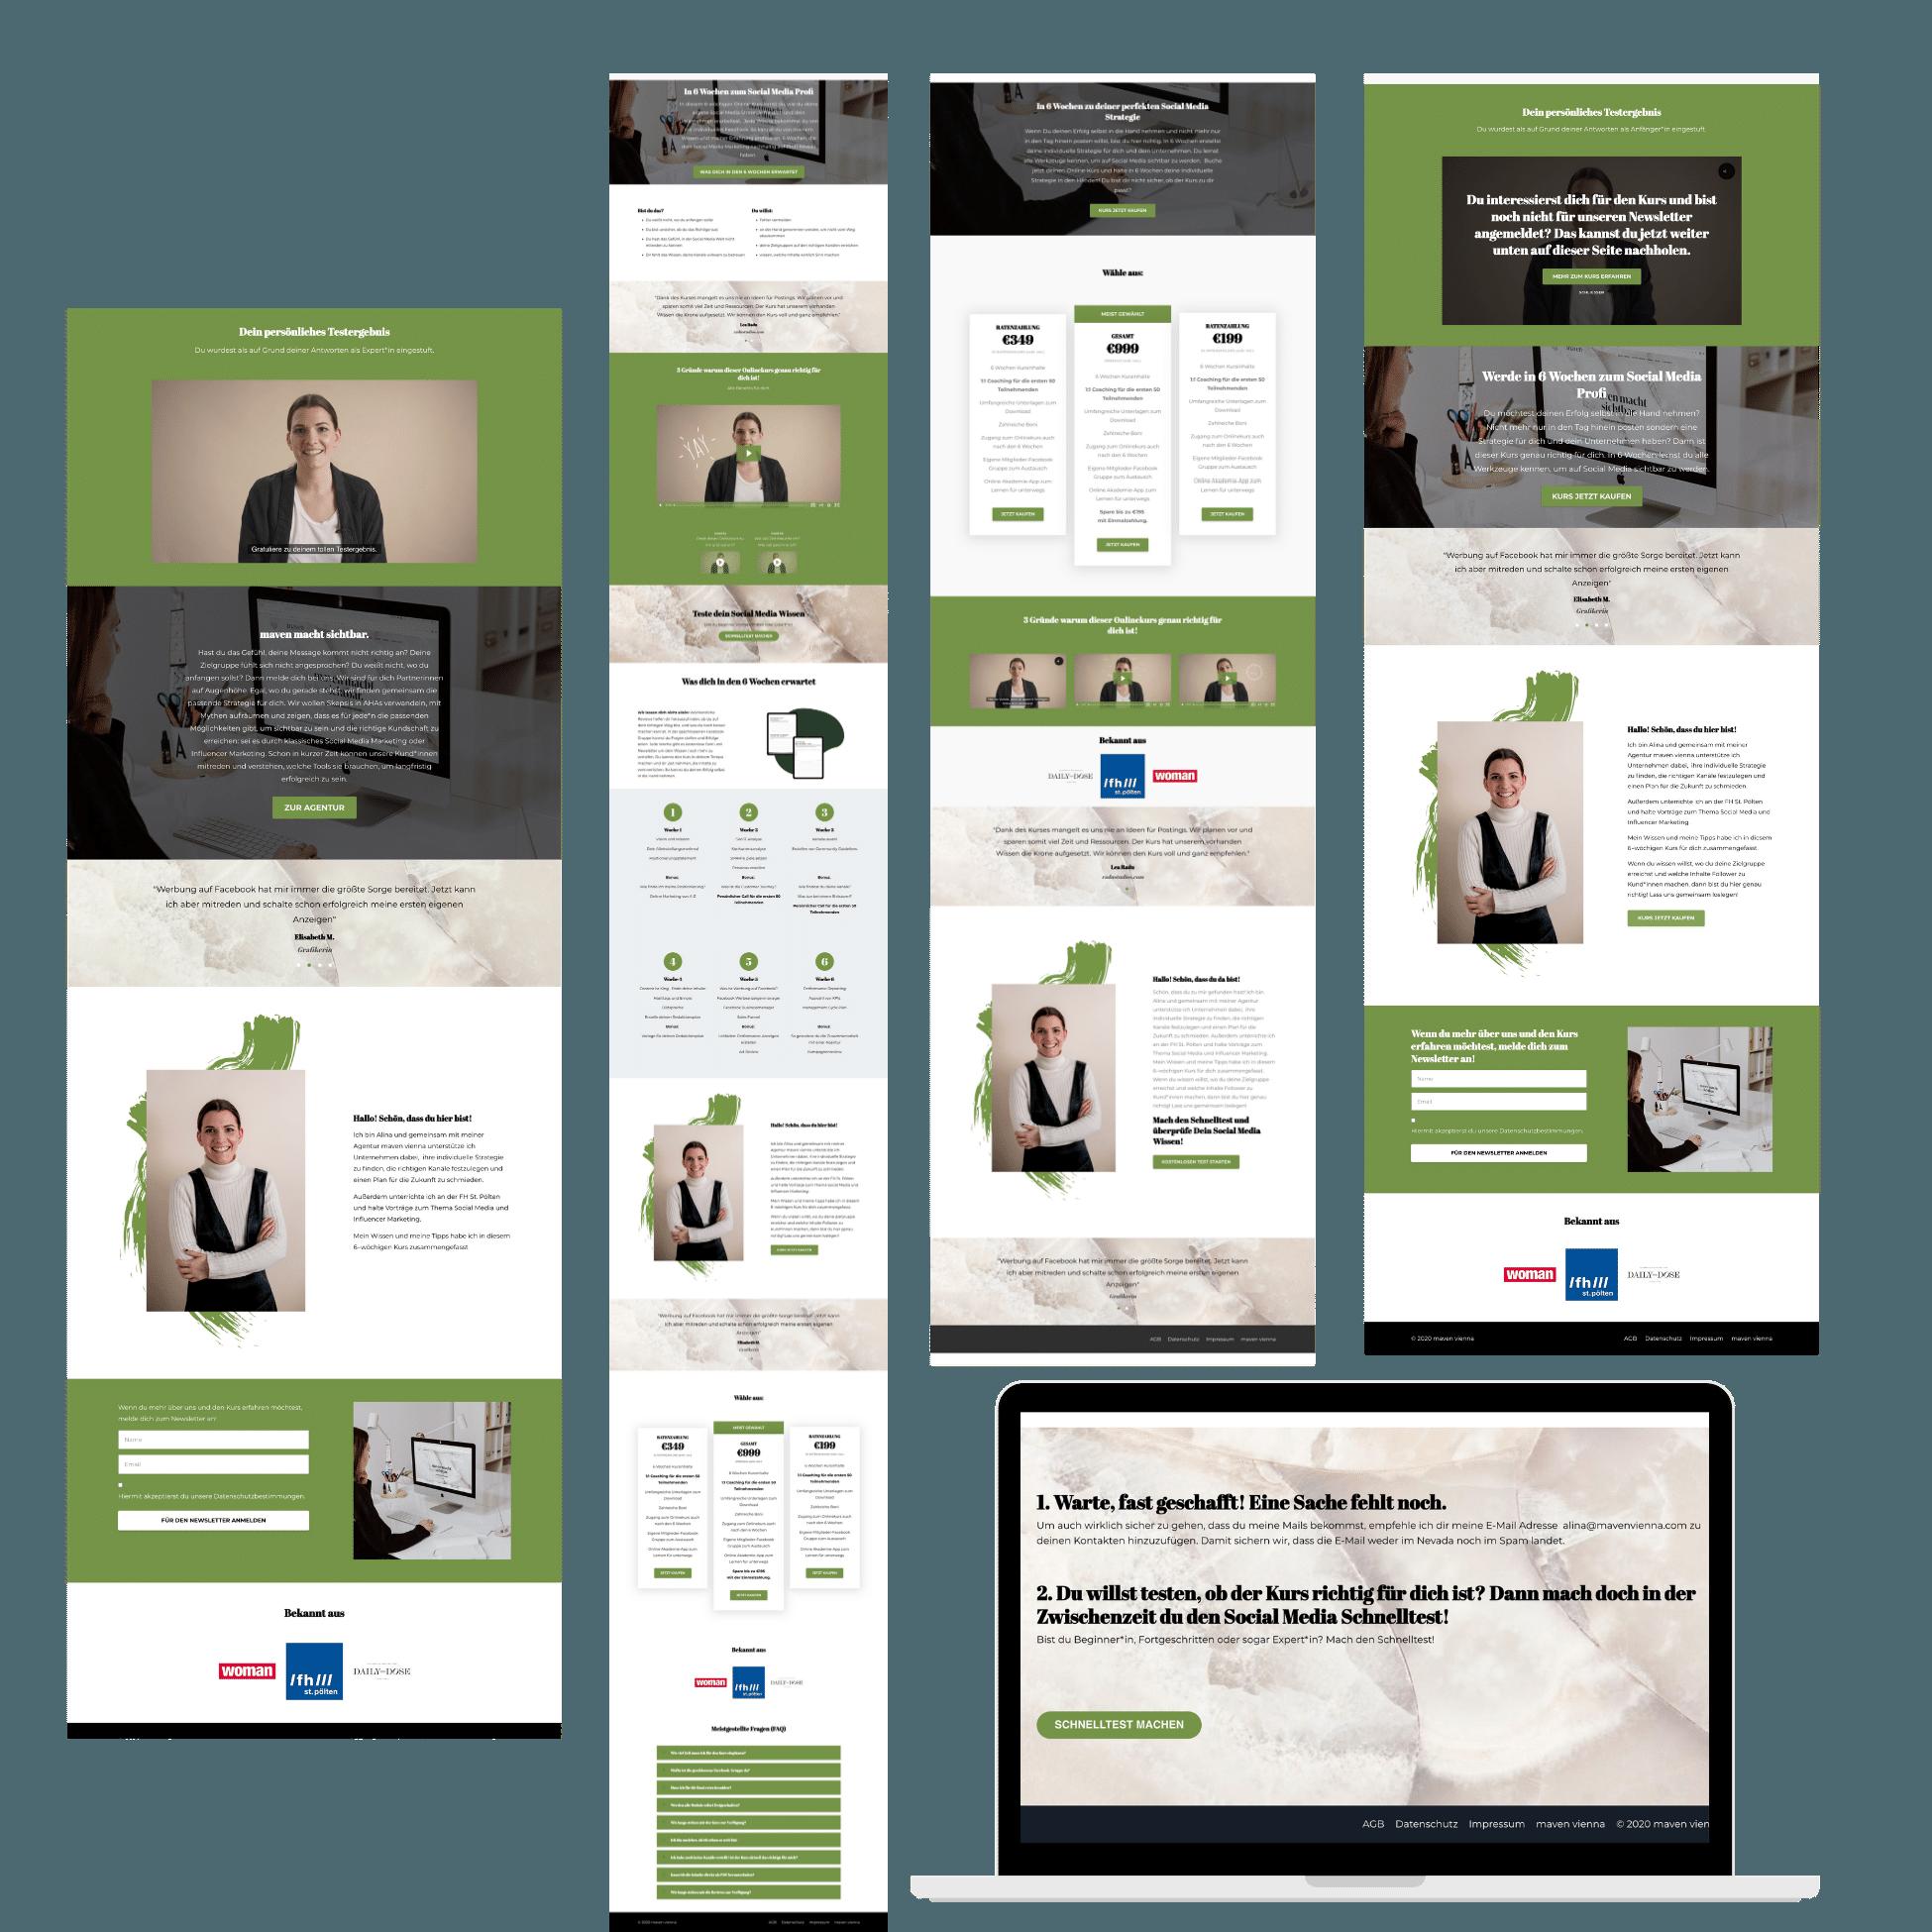 maven-vienna-online-kurs-sales-funnel-2020